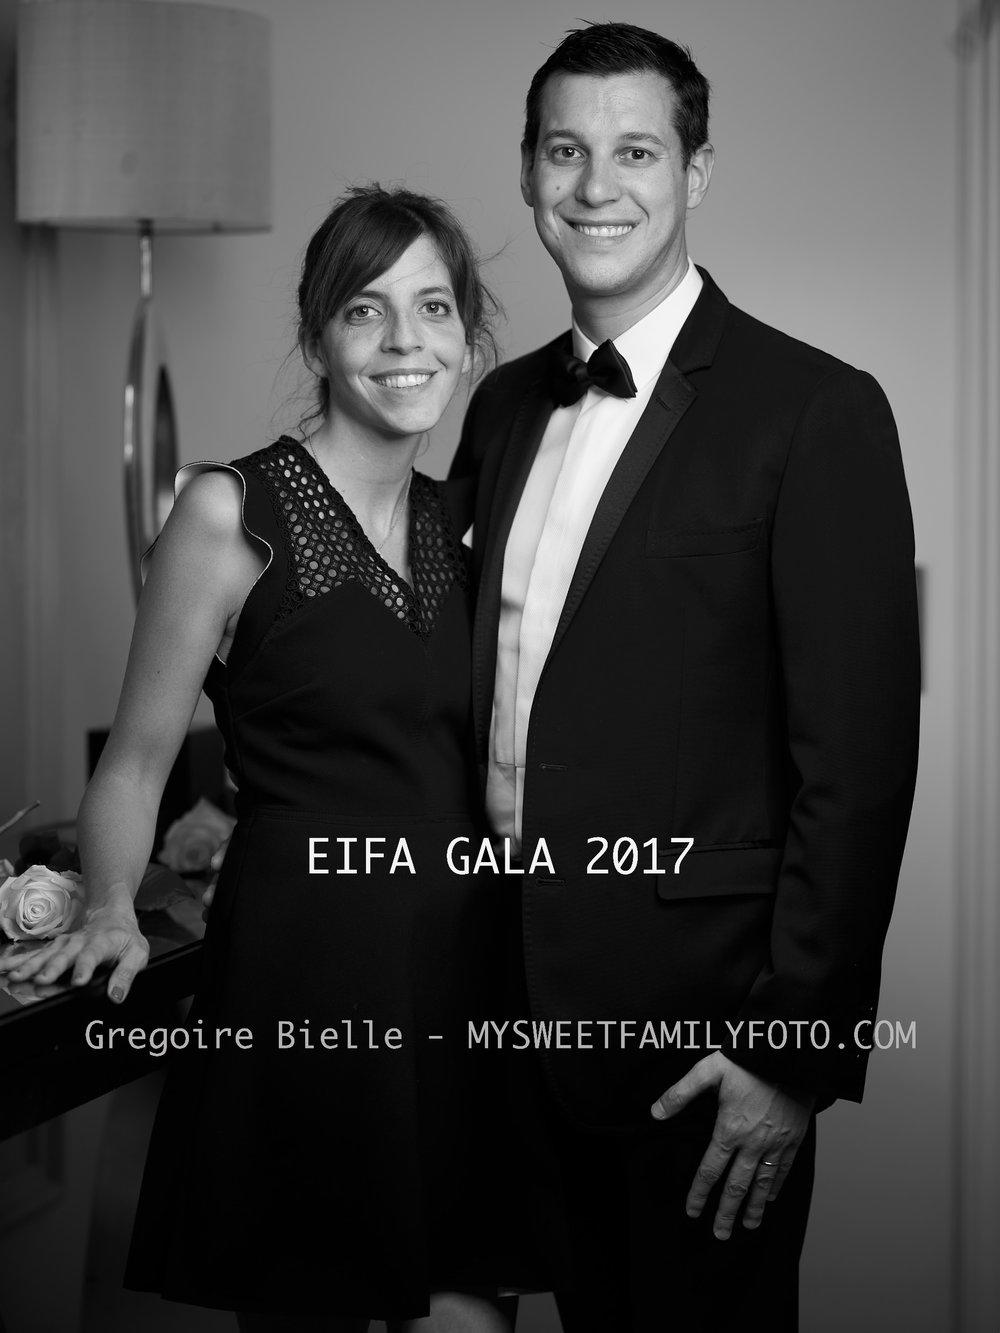 EIFA GALA 1352.jpg